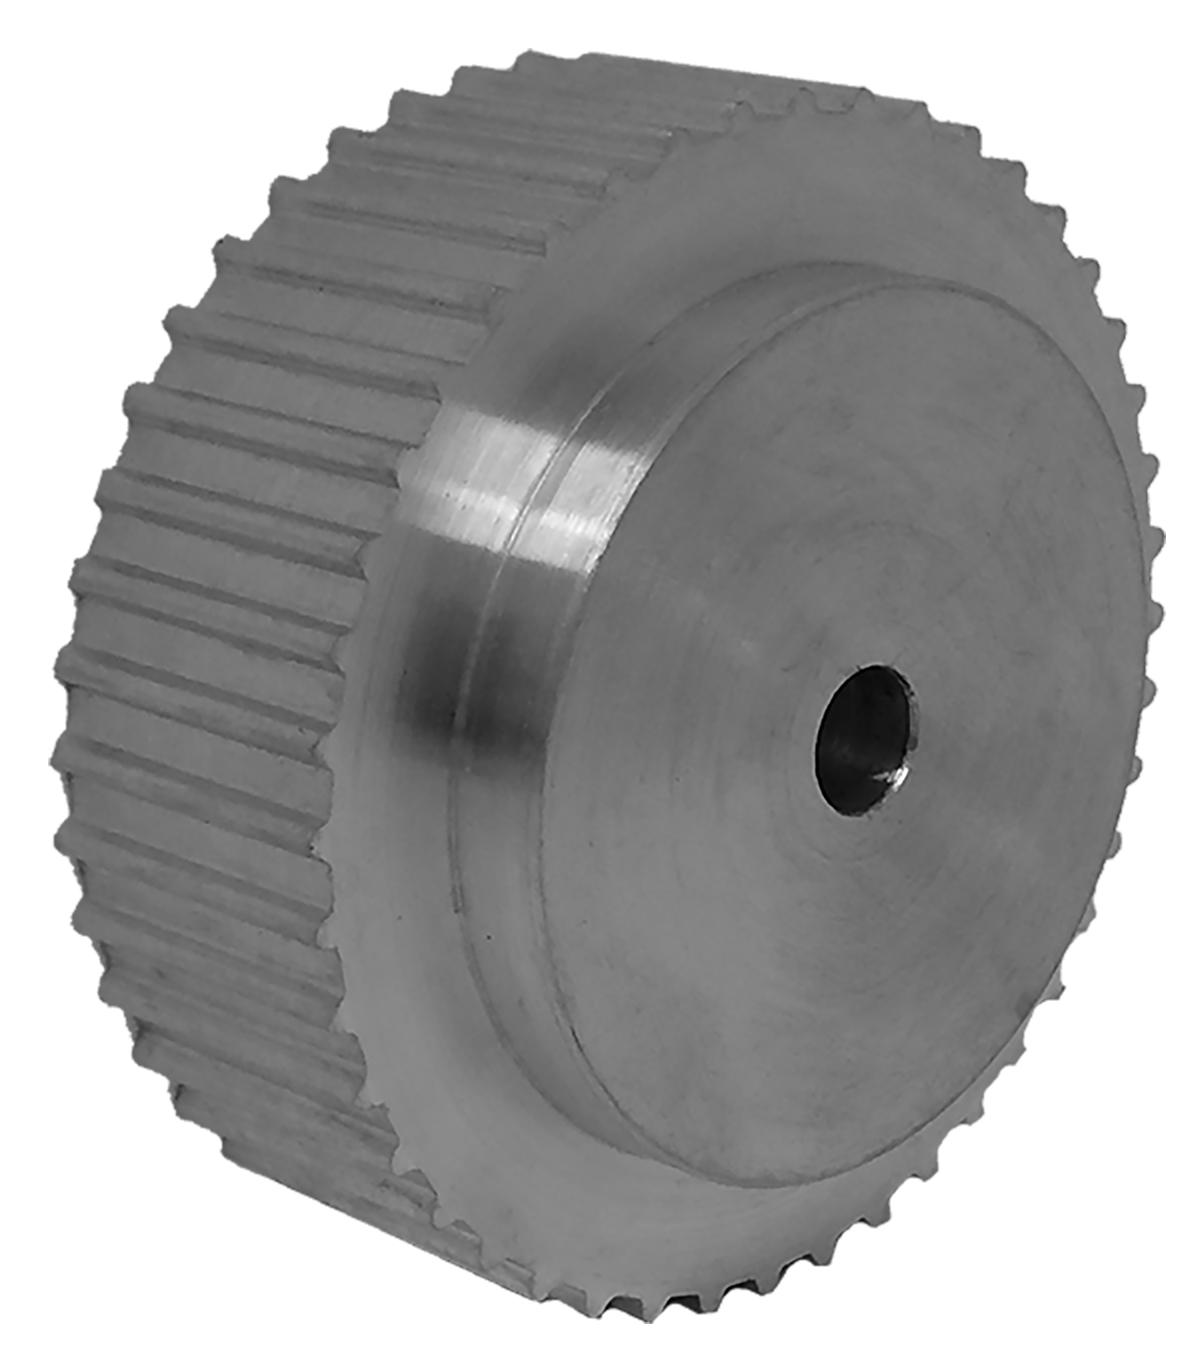 27AT5/44-0 - Aluminum Metric Pulleys